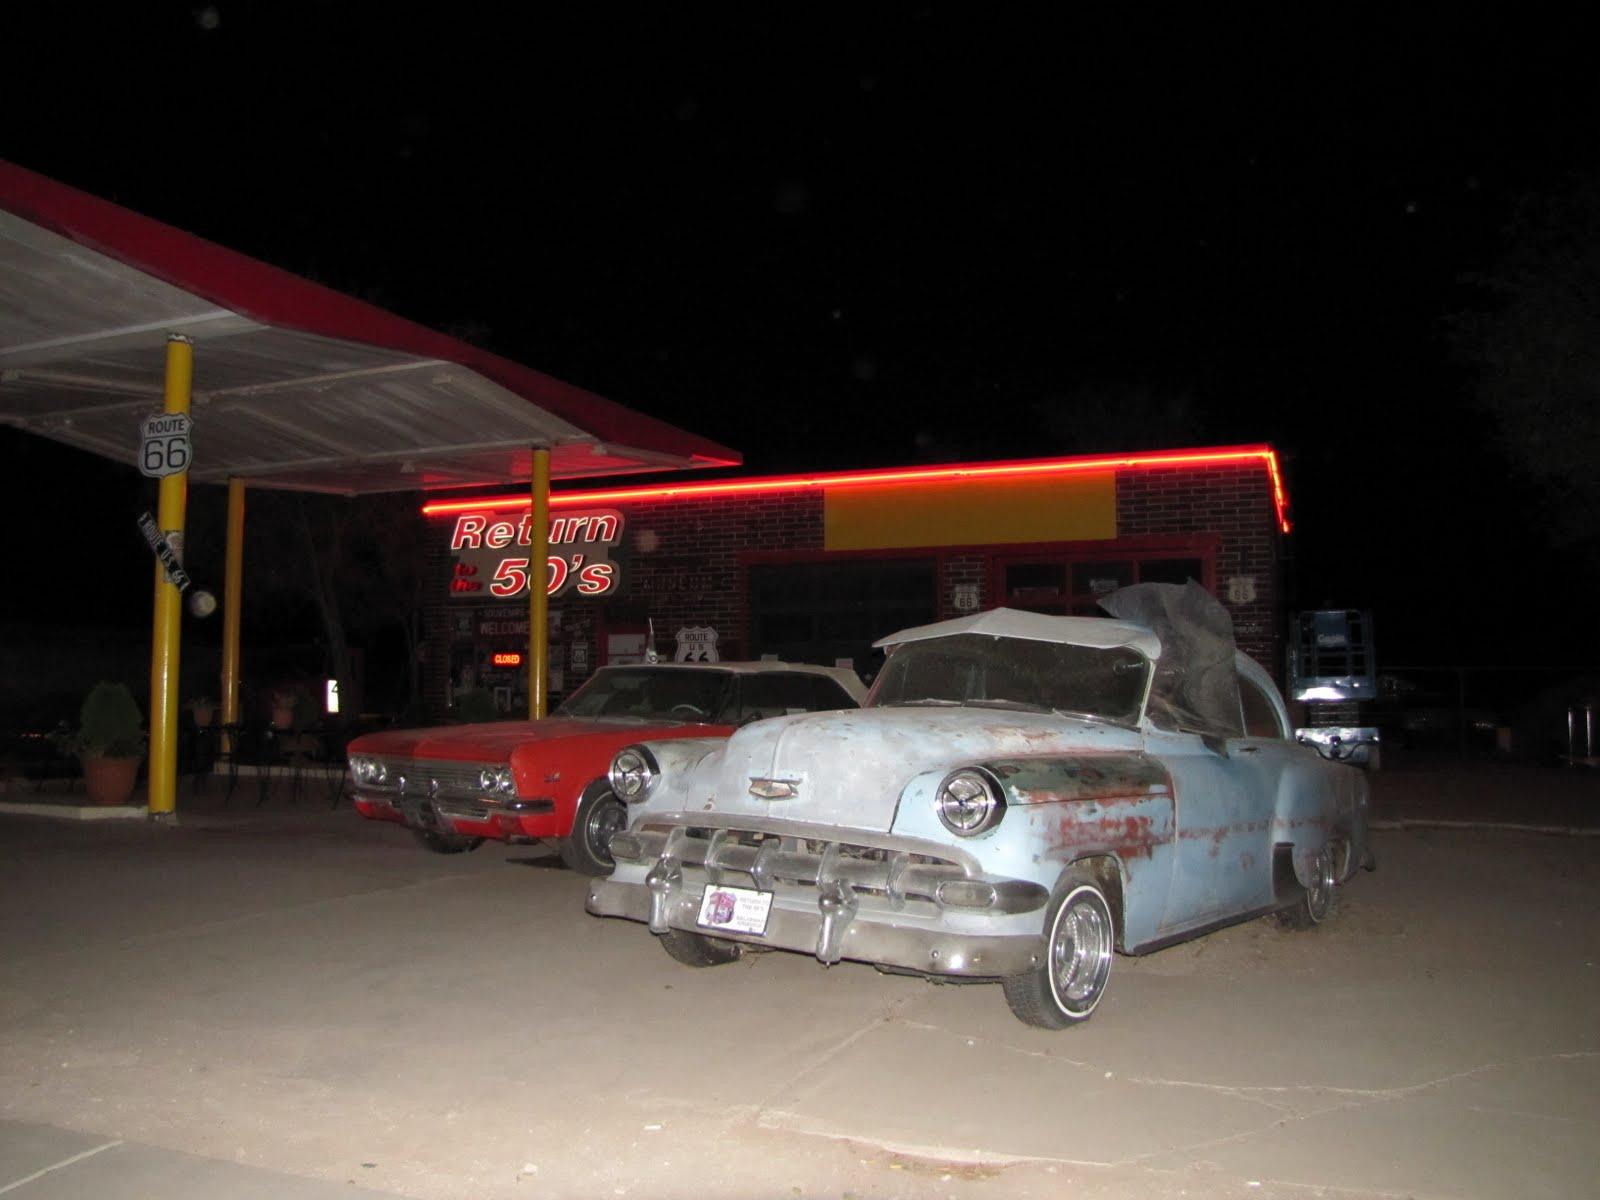 Route 66, Arizona, 1966 Chevrolet Impala, 1954 Chevrolet Bel Air Convertible